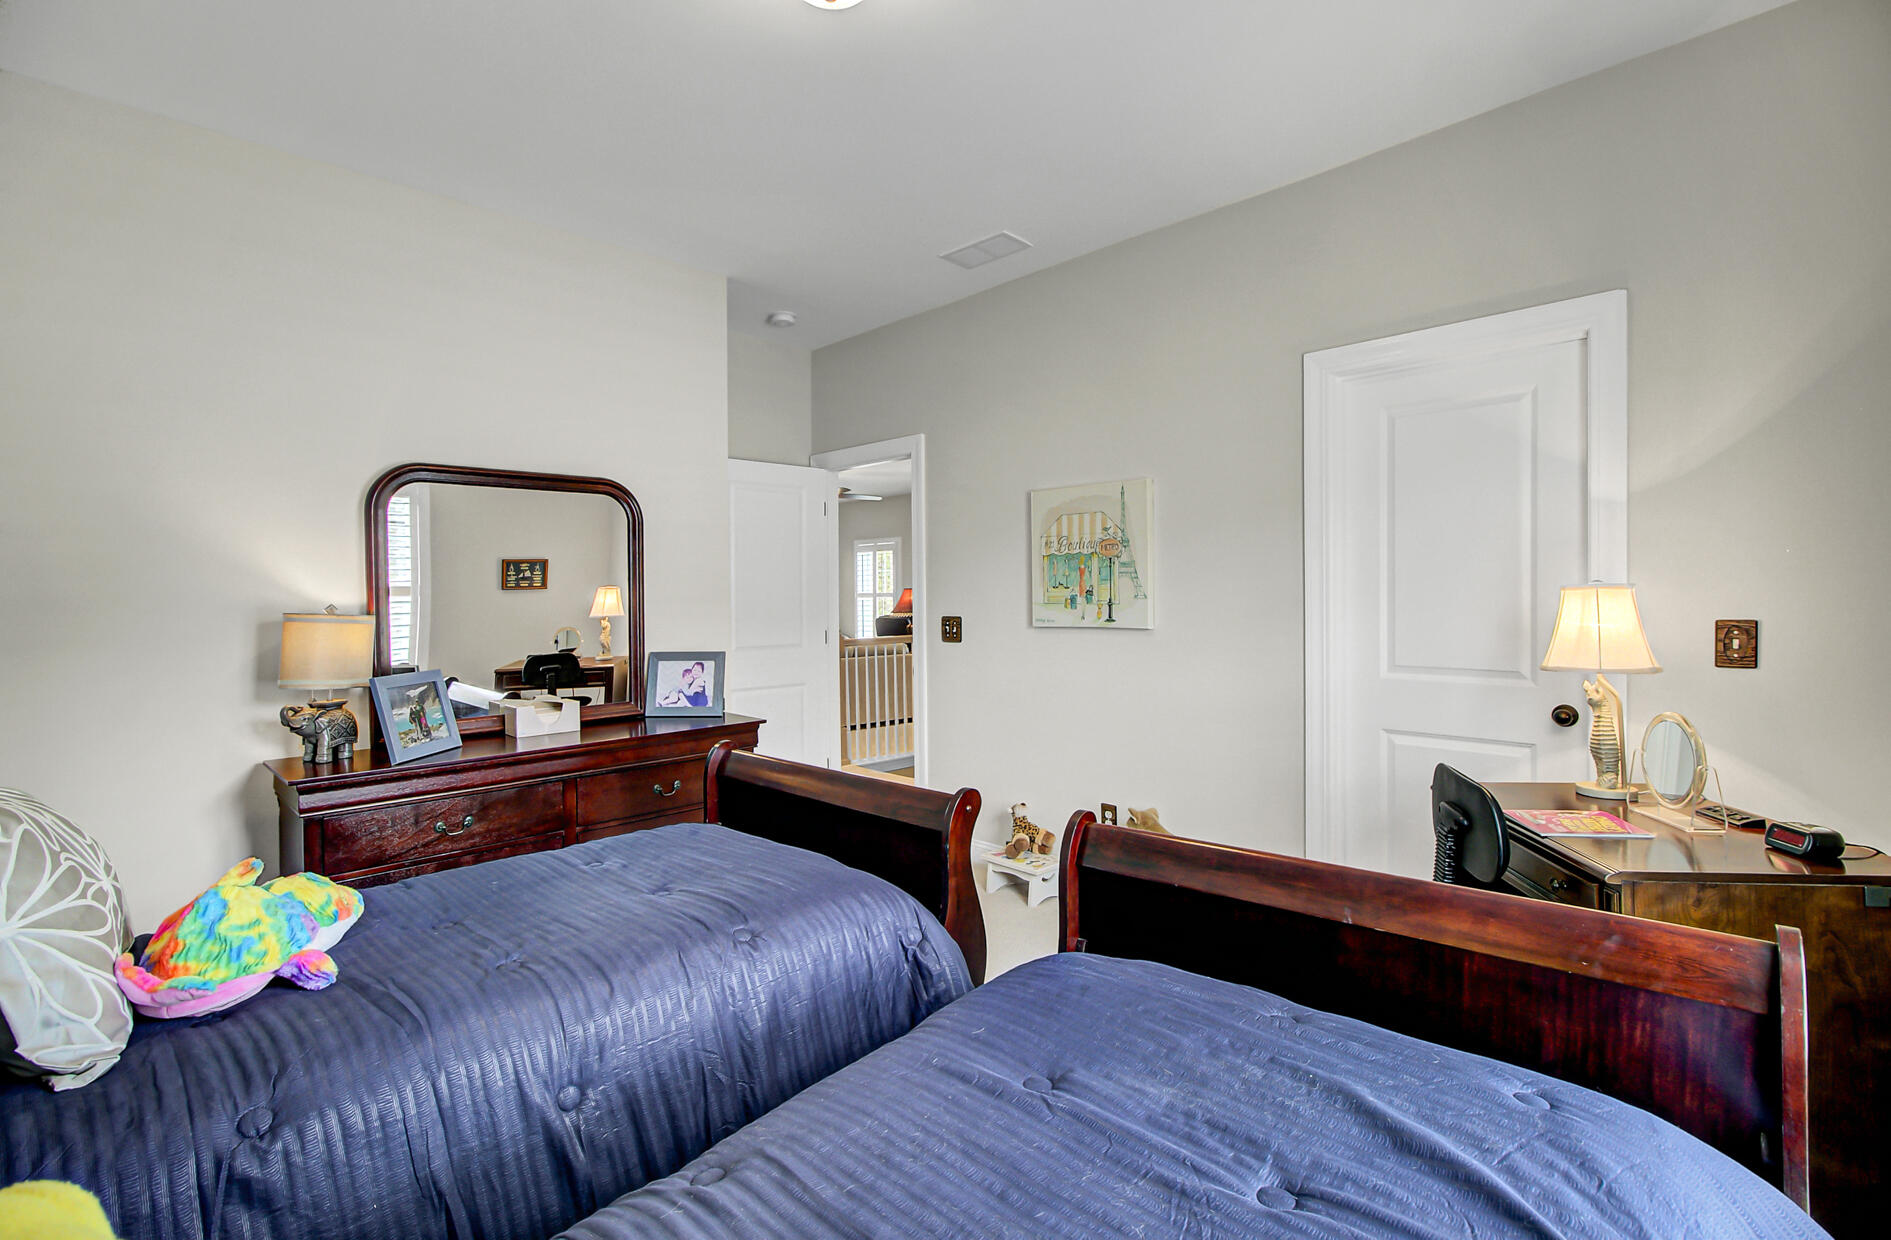 Park West Homes For Sale - 2824 Wagner, Mount Pleasant, SC - 35